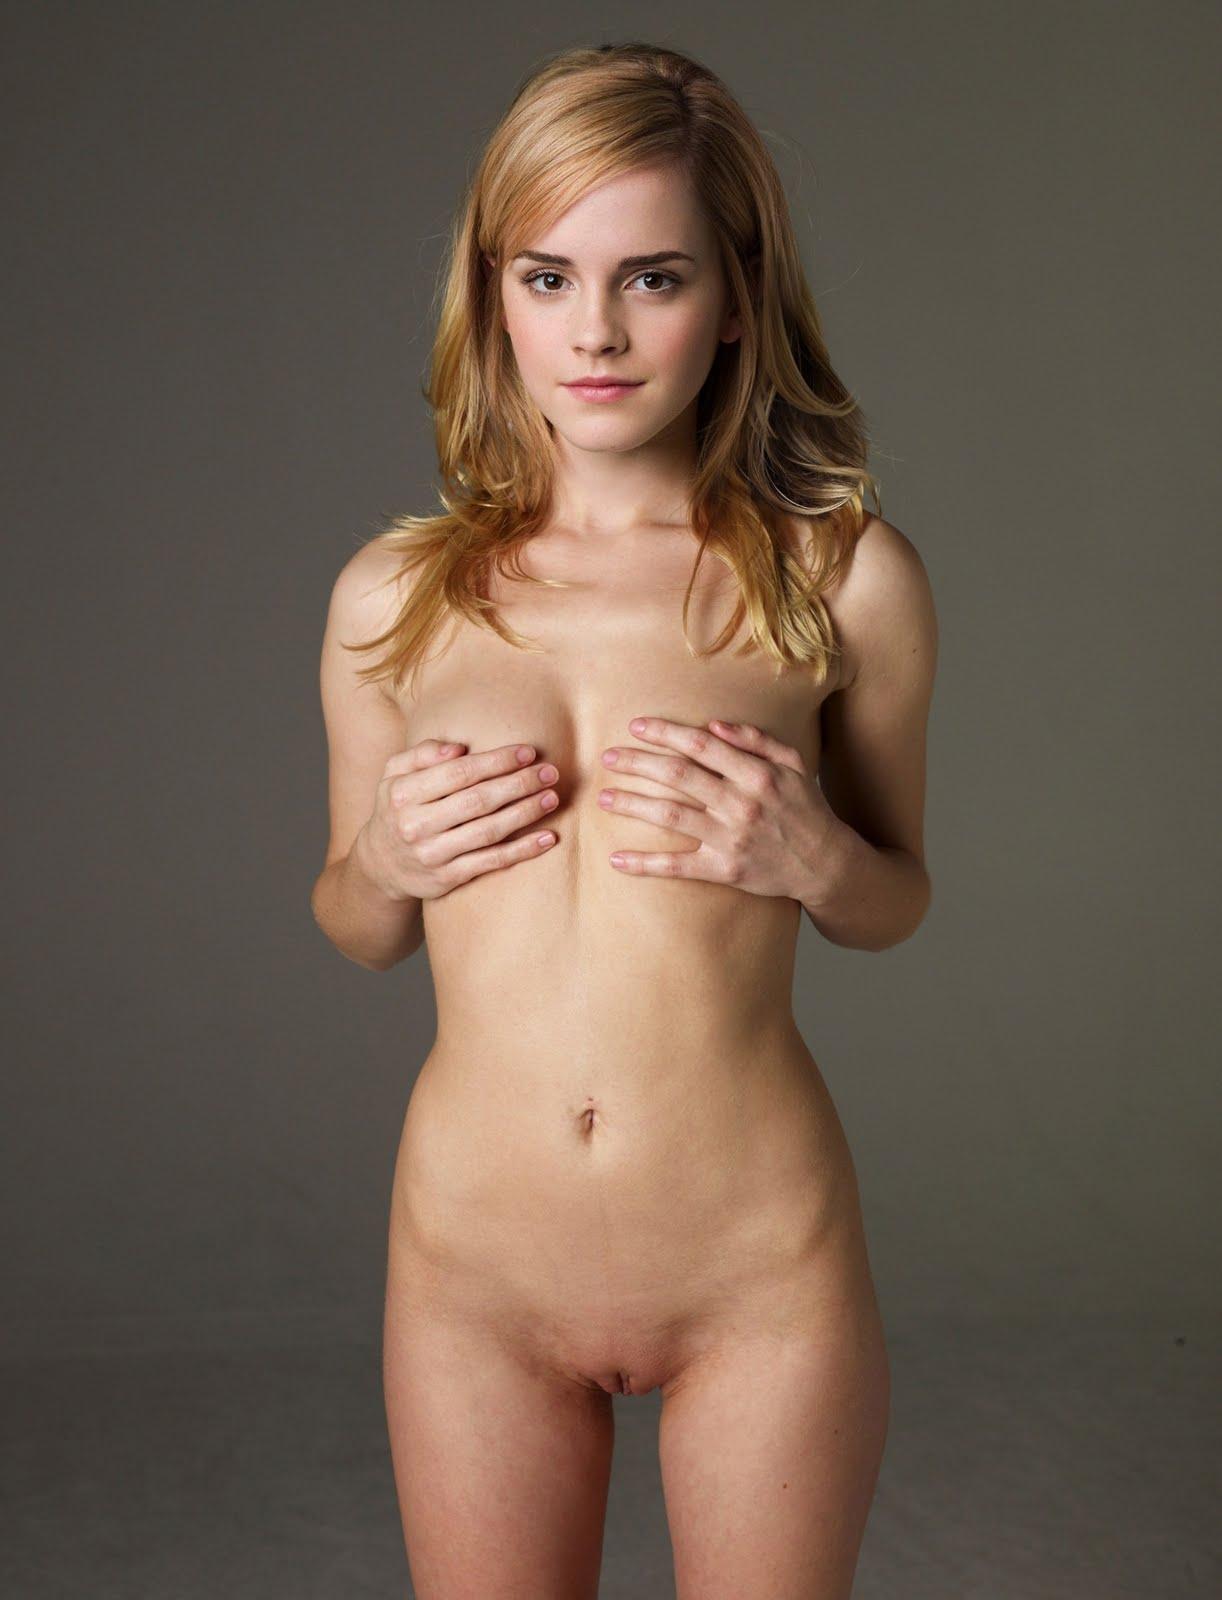 Emma Watson Semi Nude Pictures